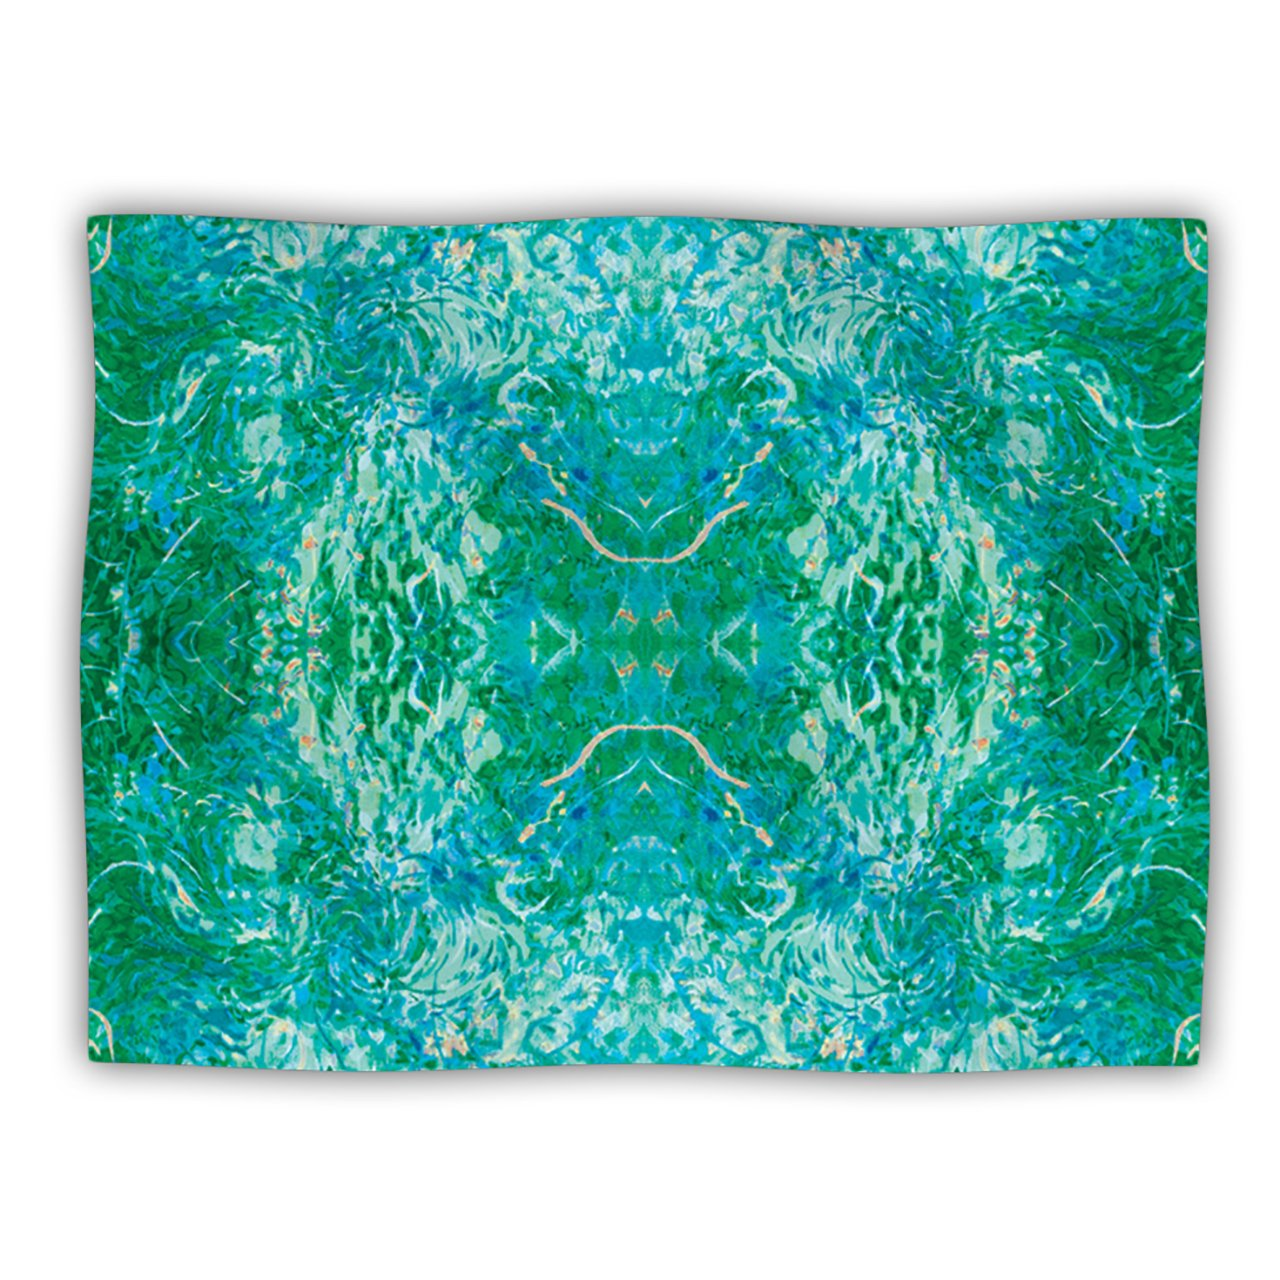 Kess InHouse Nikposium 'Eden' Teal Green Dog Blanket, 40 by 30-Inch